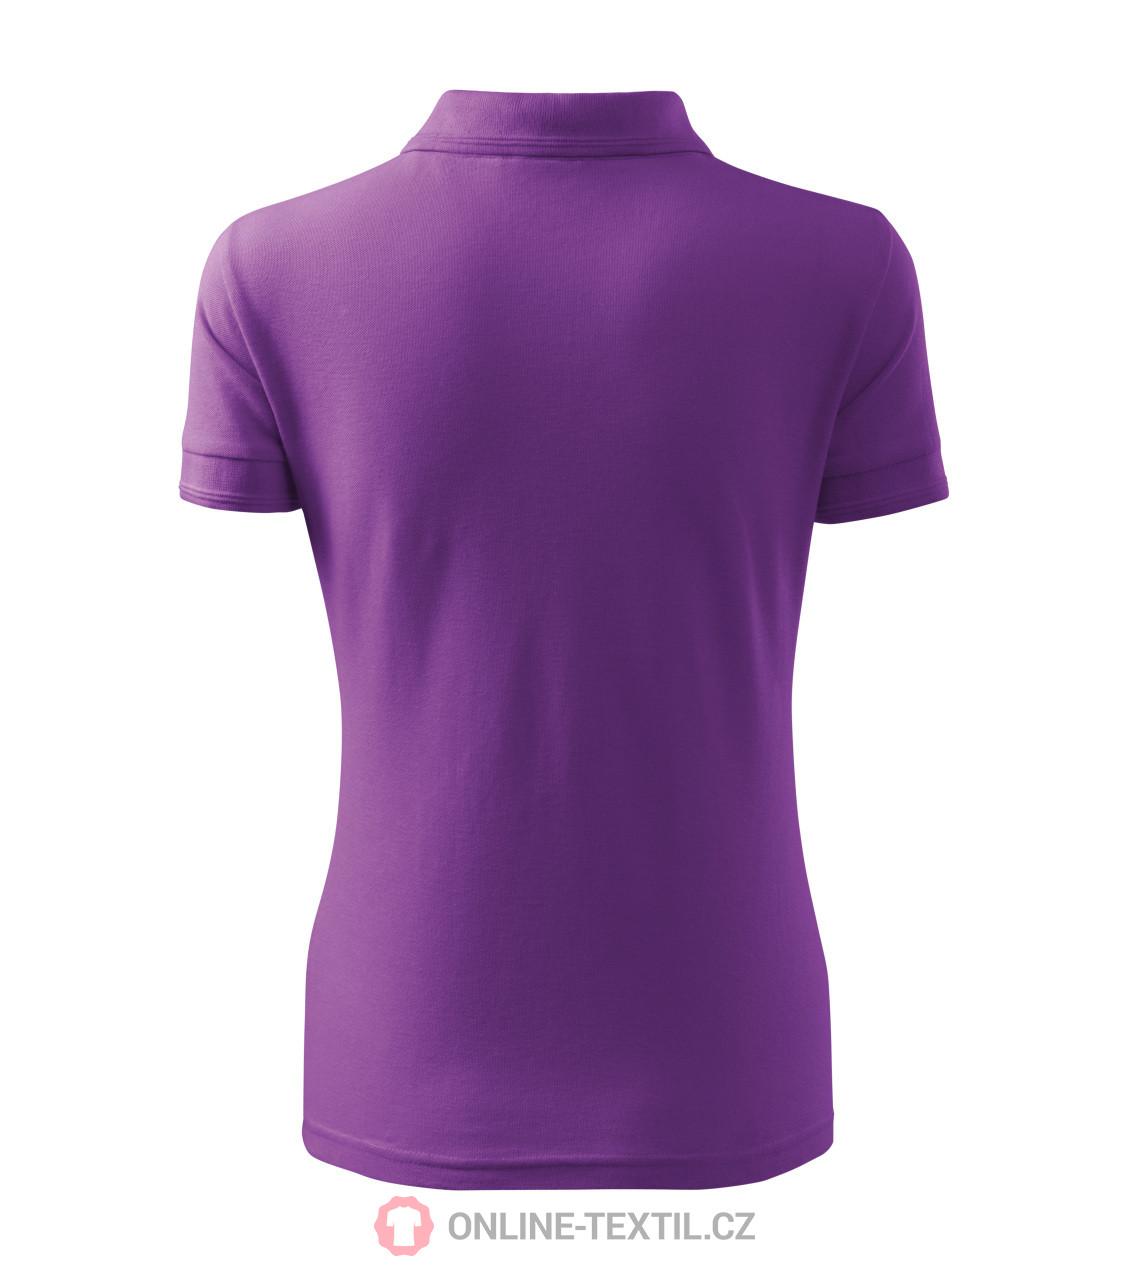 ADLER CZECH Heavyweight ladies polo shirt Pique Polo 210 - purple ... 0dfeb01759f4